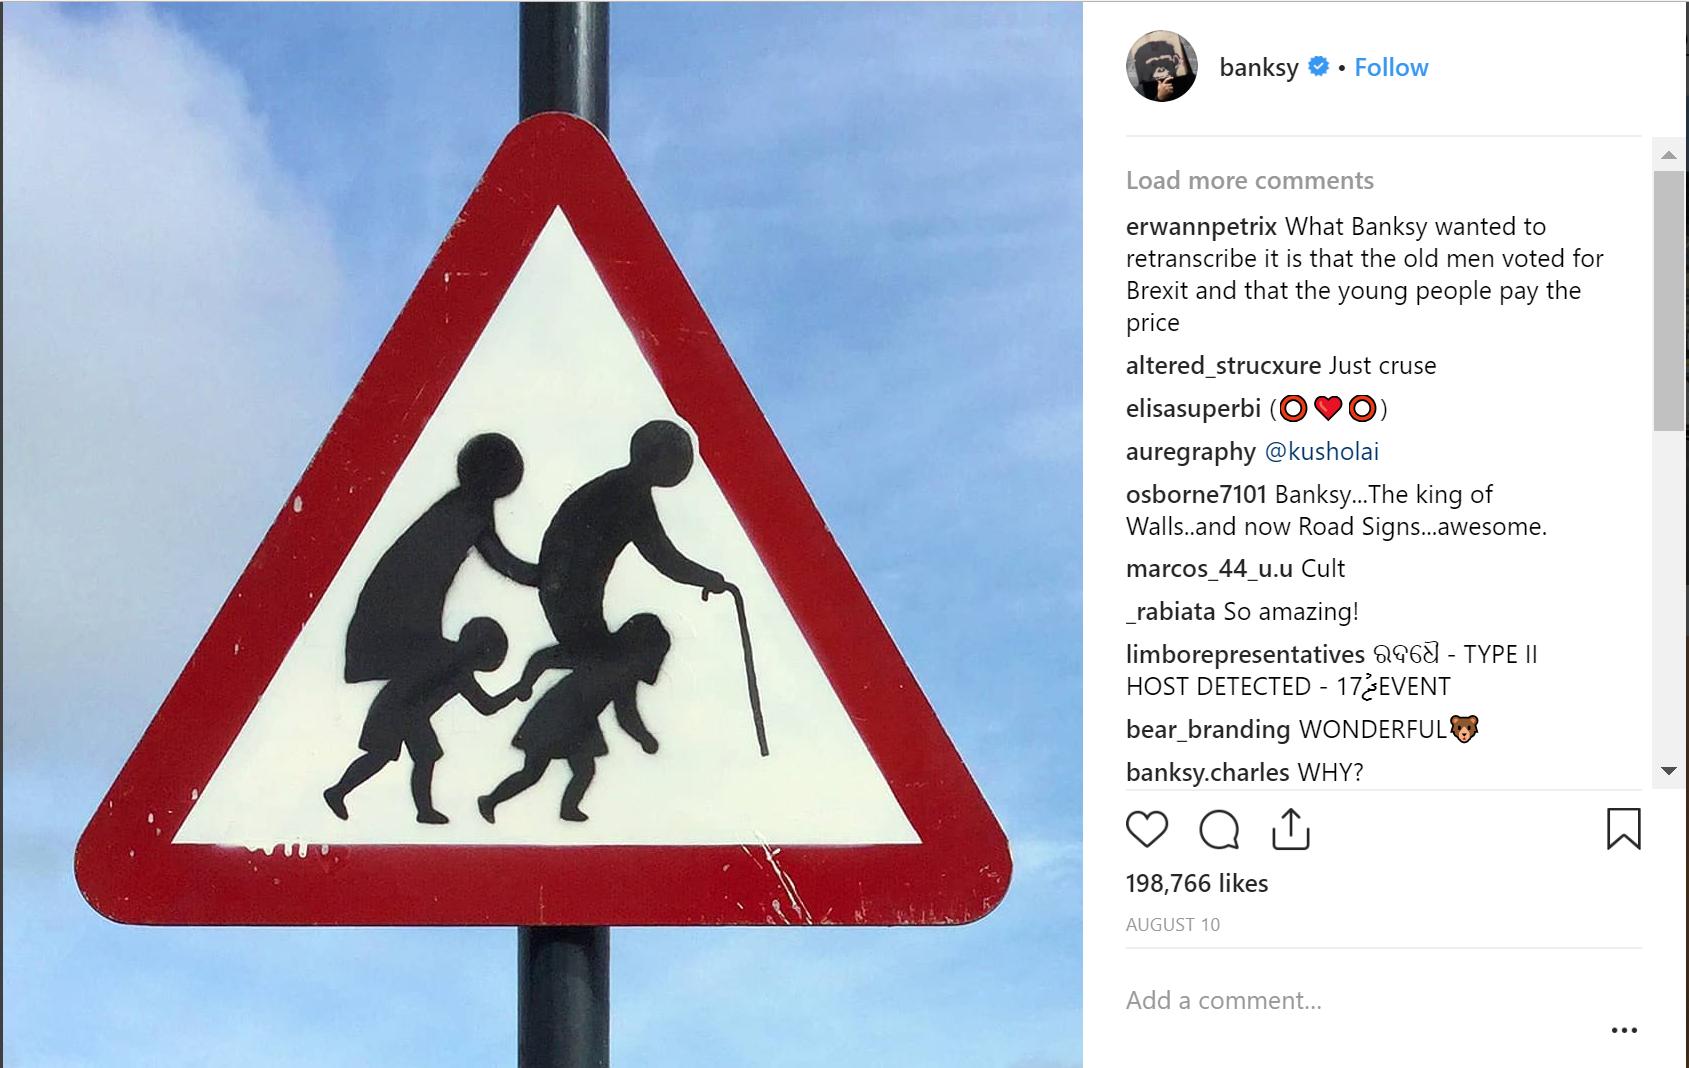 Instagram artist bansky account